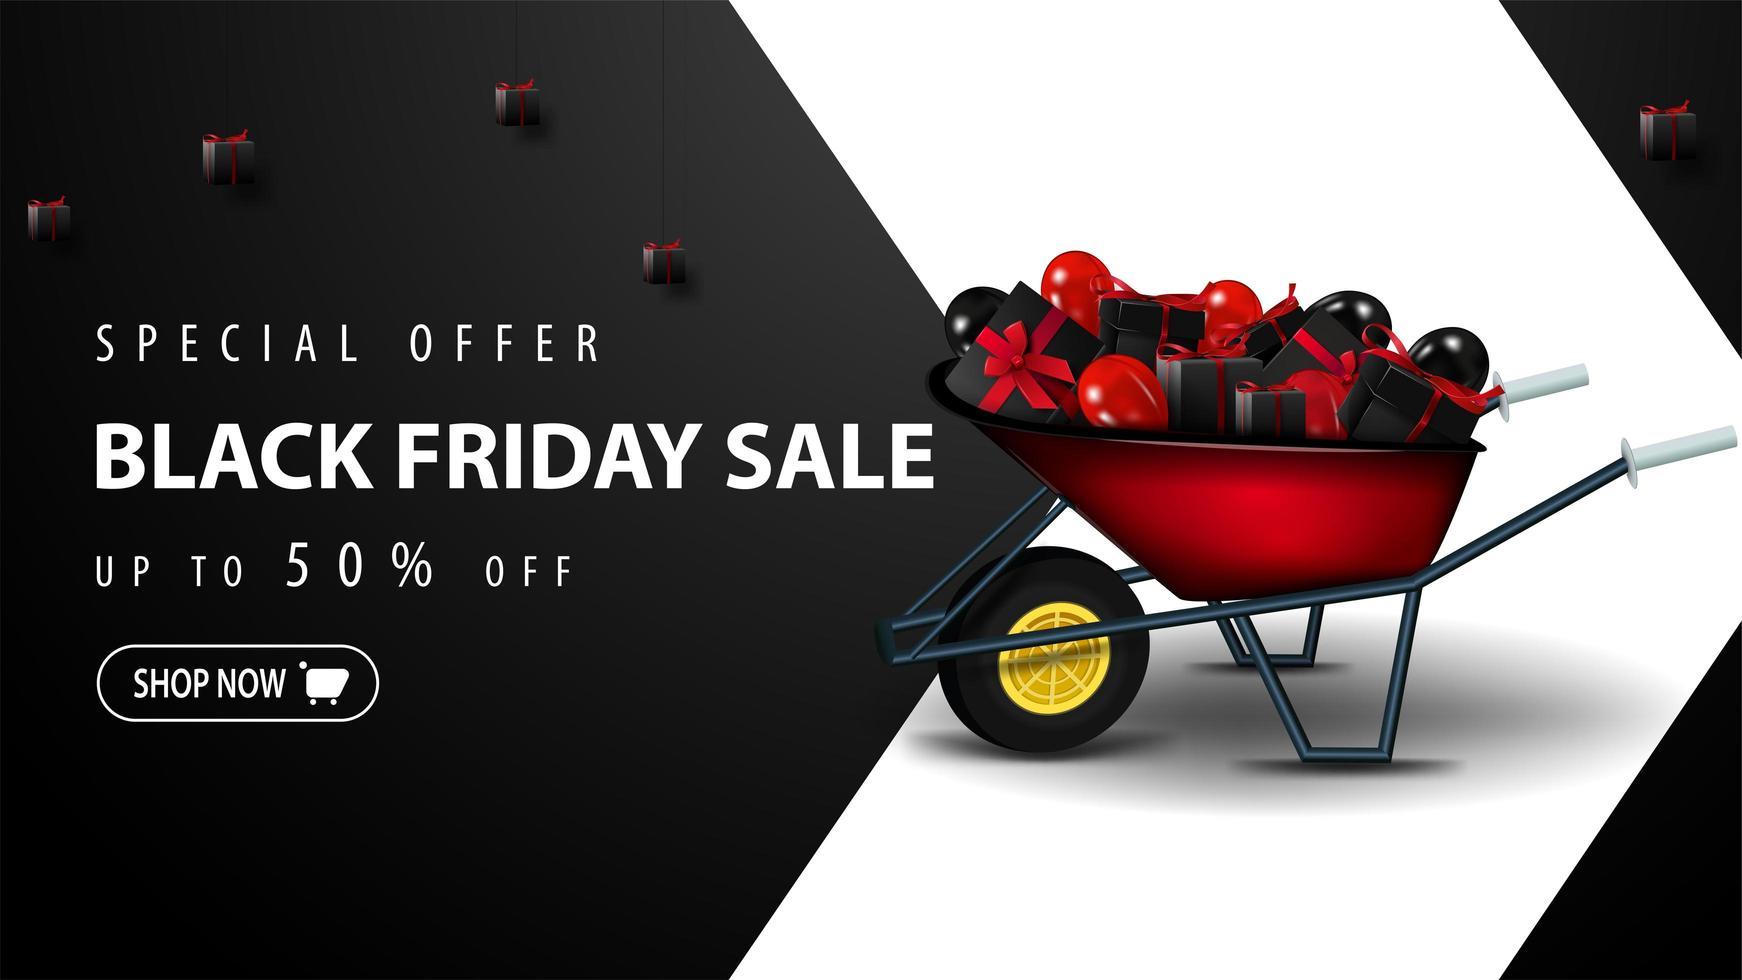 Sonderangebot, Black Friday Sale Vorlage vektor